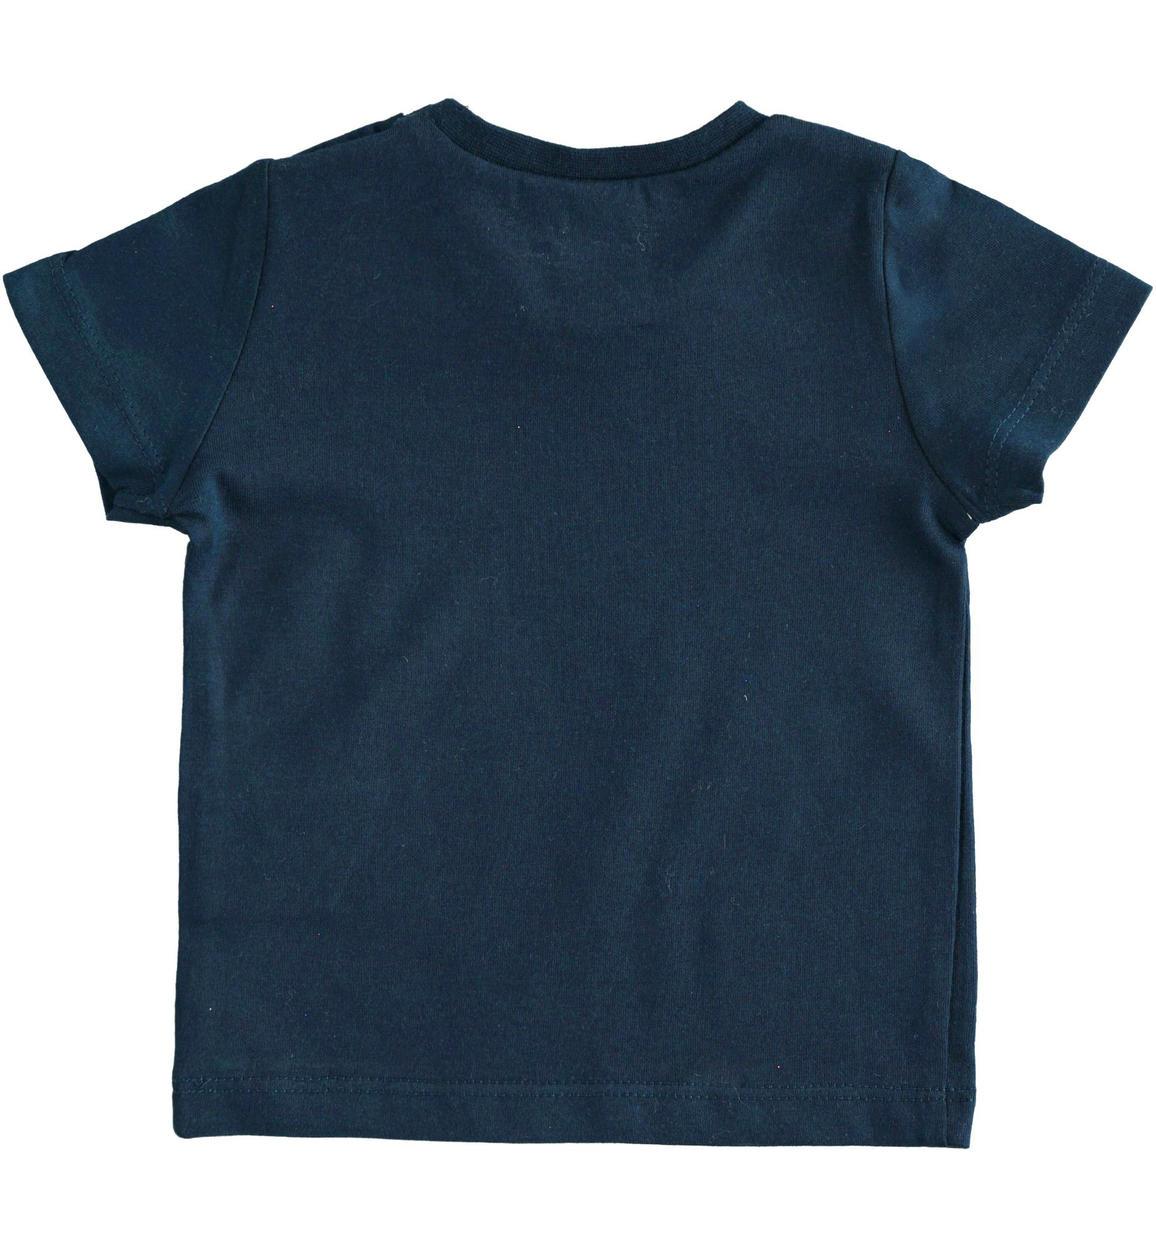 tshirt in jersey 100 cotone per neonat navy retro 02 0214j60000 3885 150x150